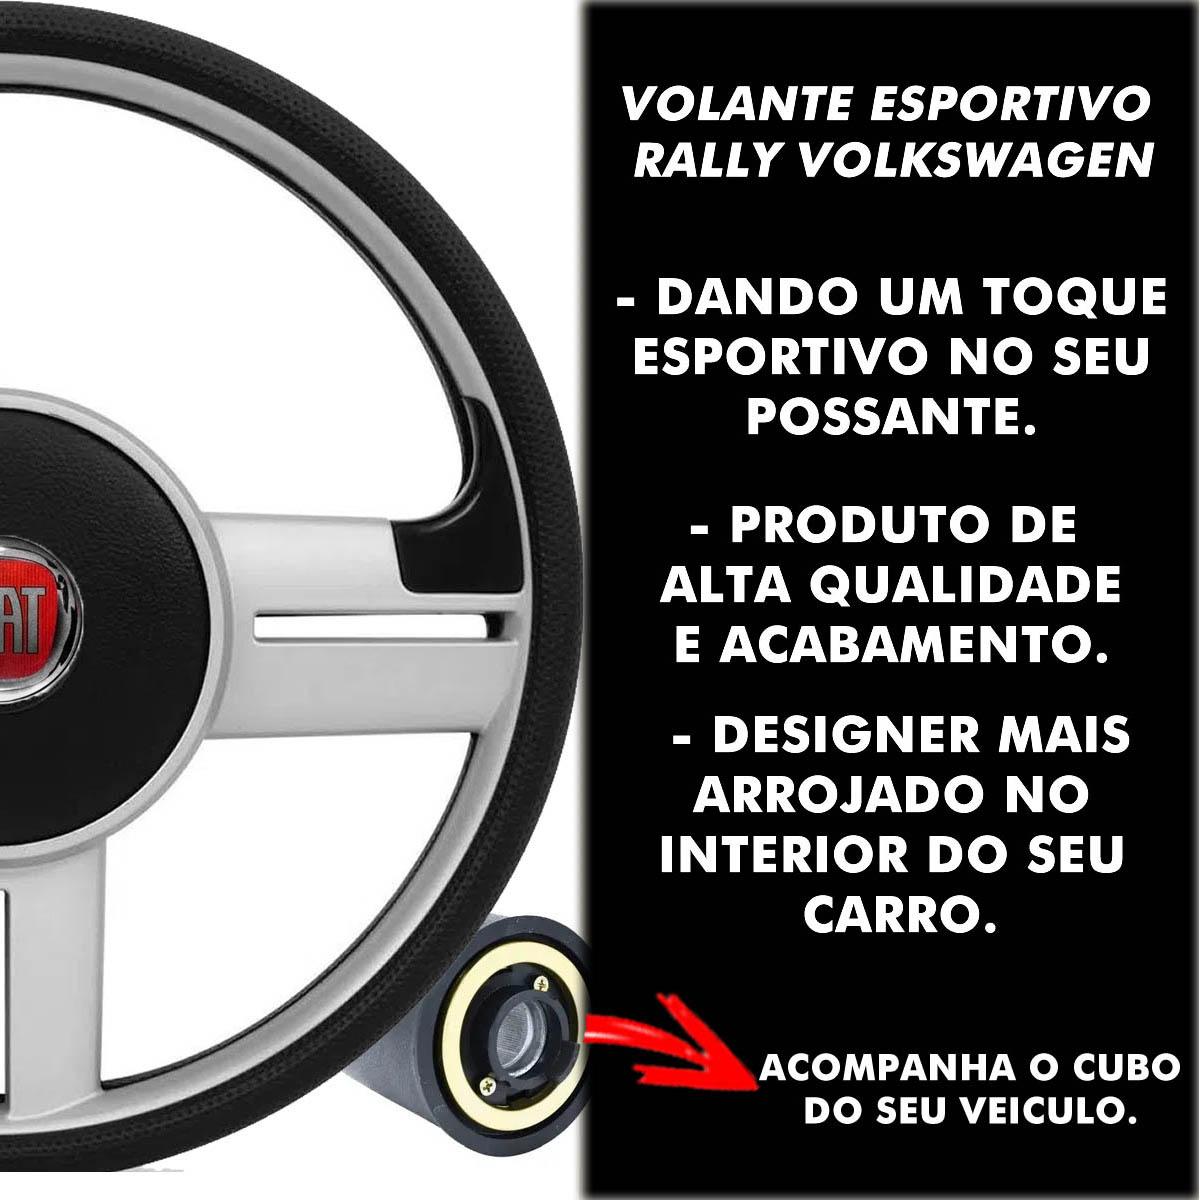 Volante Fiat Surf Rallye Esportivo Cubo Atacado Poliparts